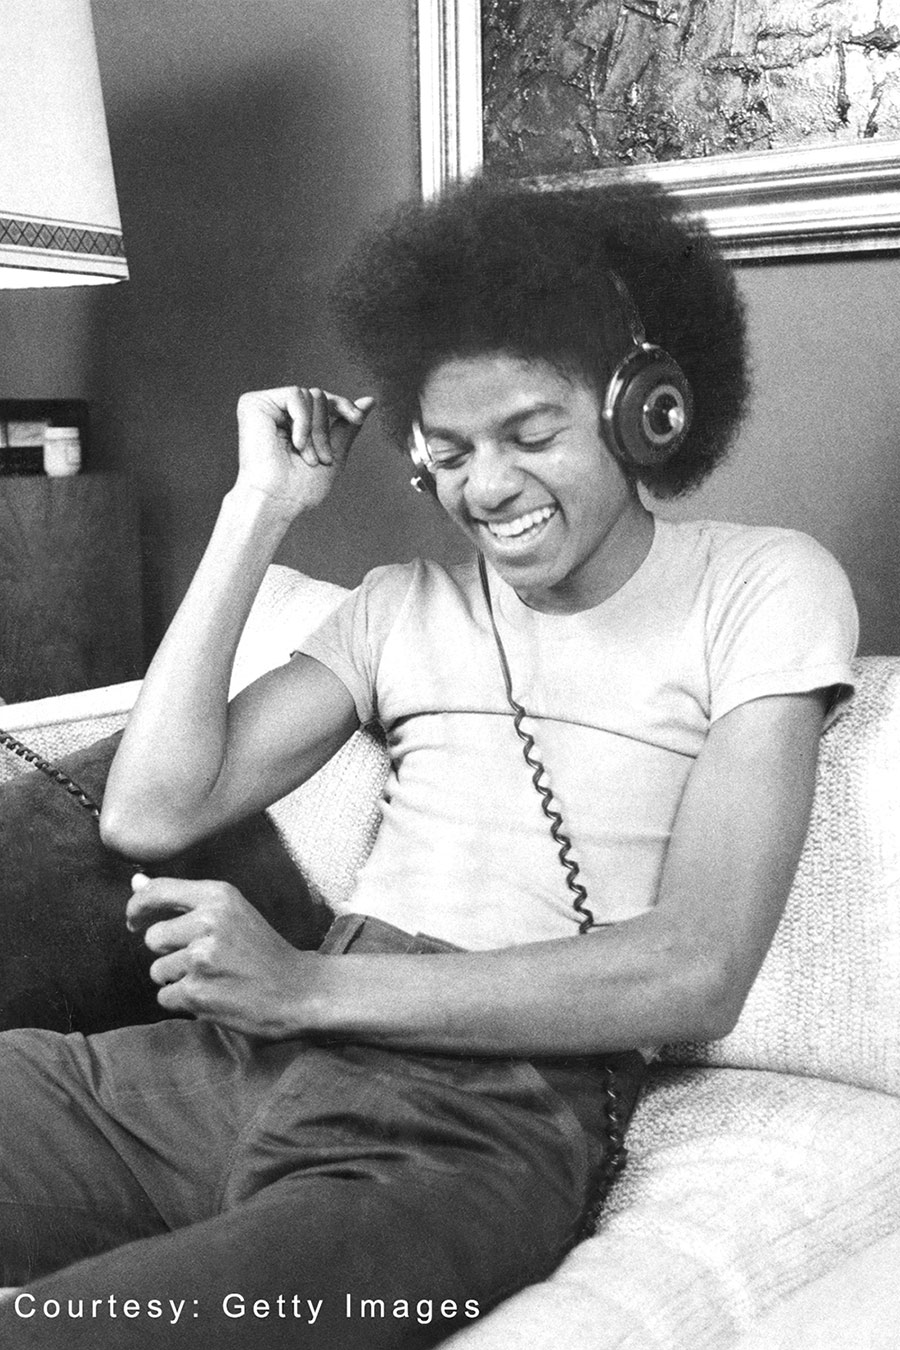 Michael Jackson listens to music on November 17, 1977